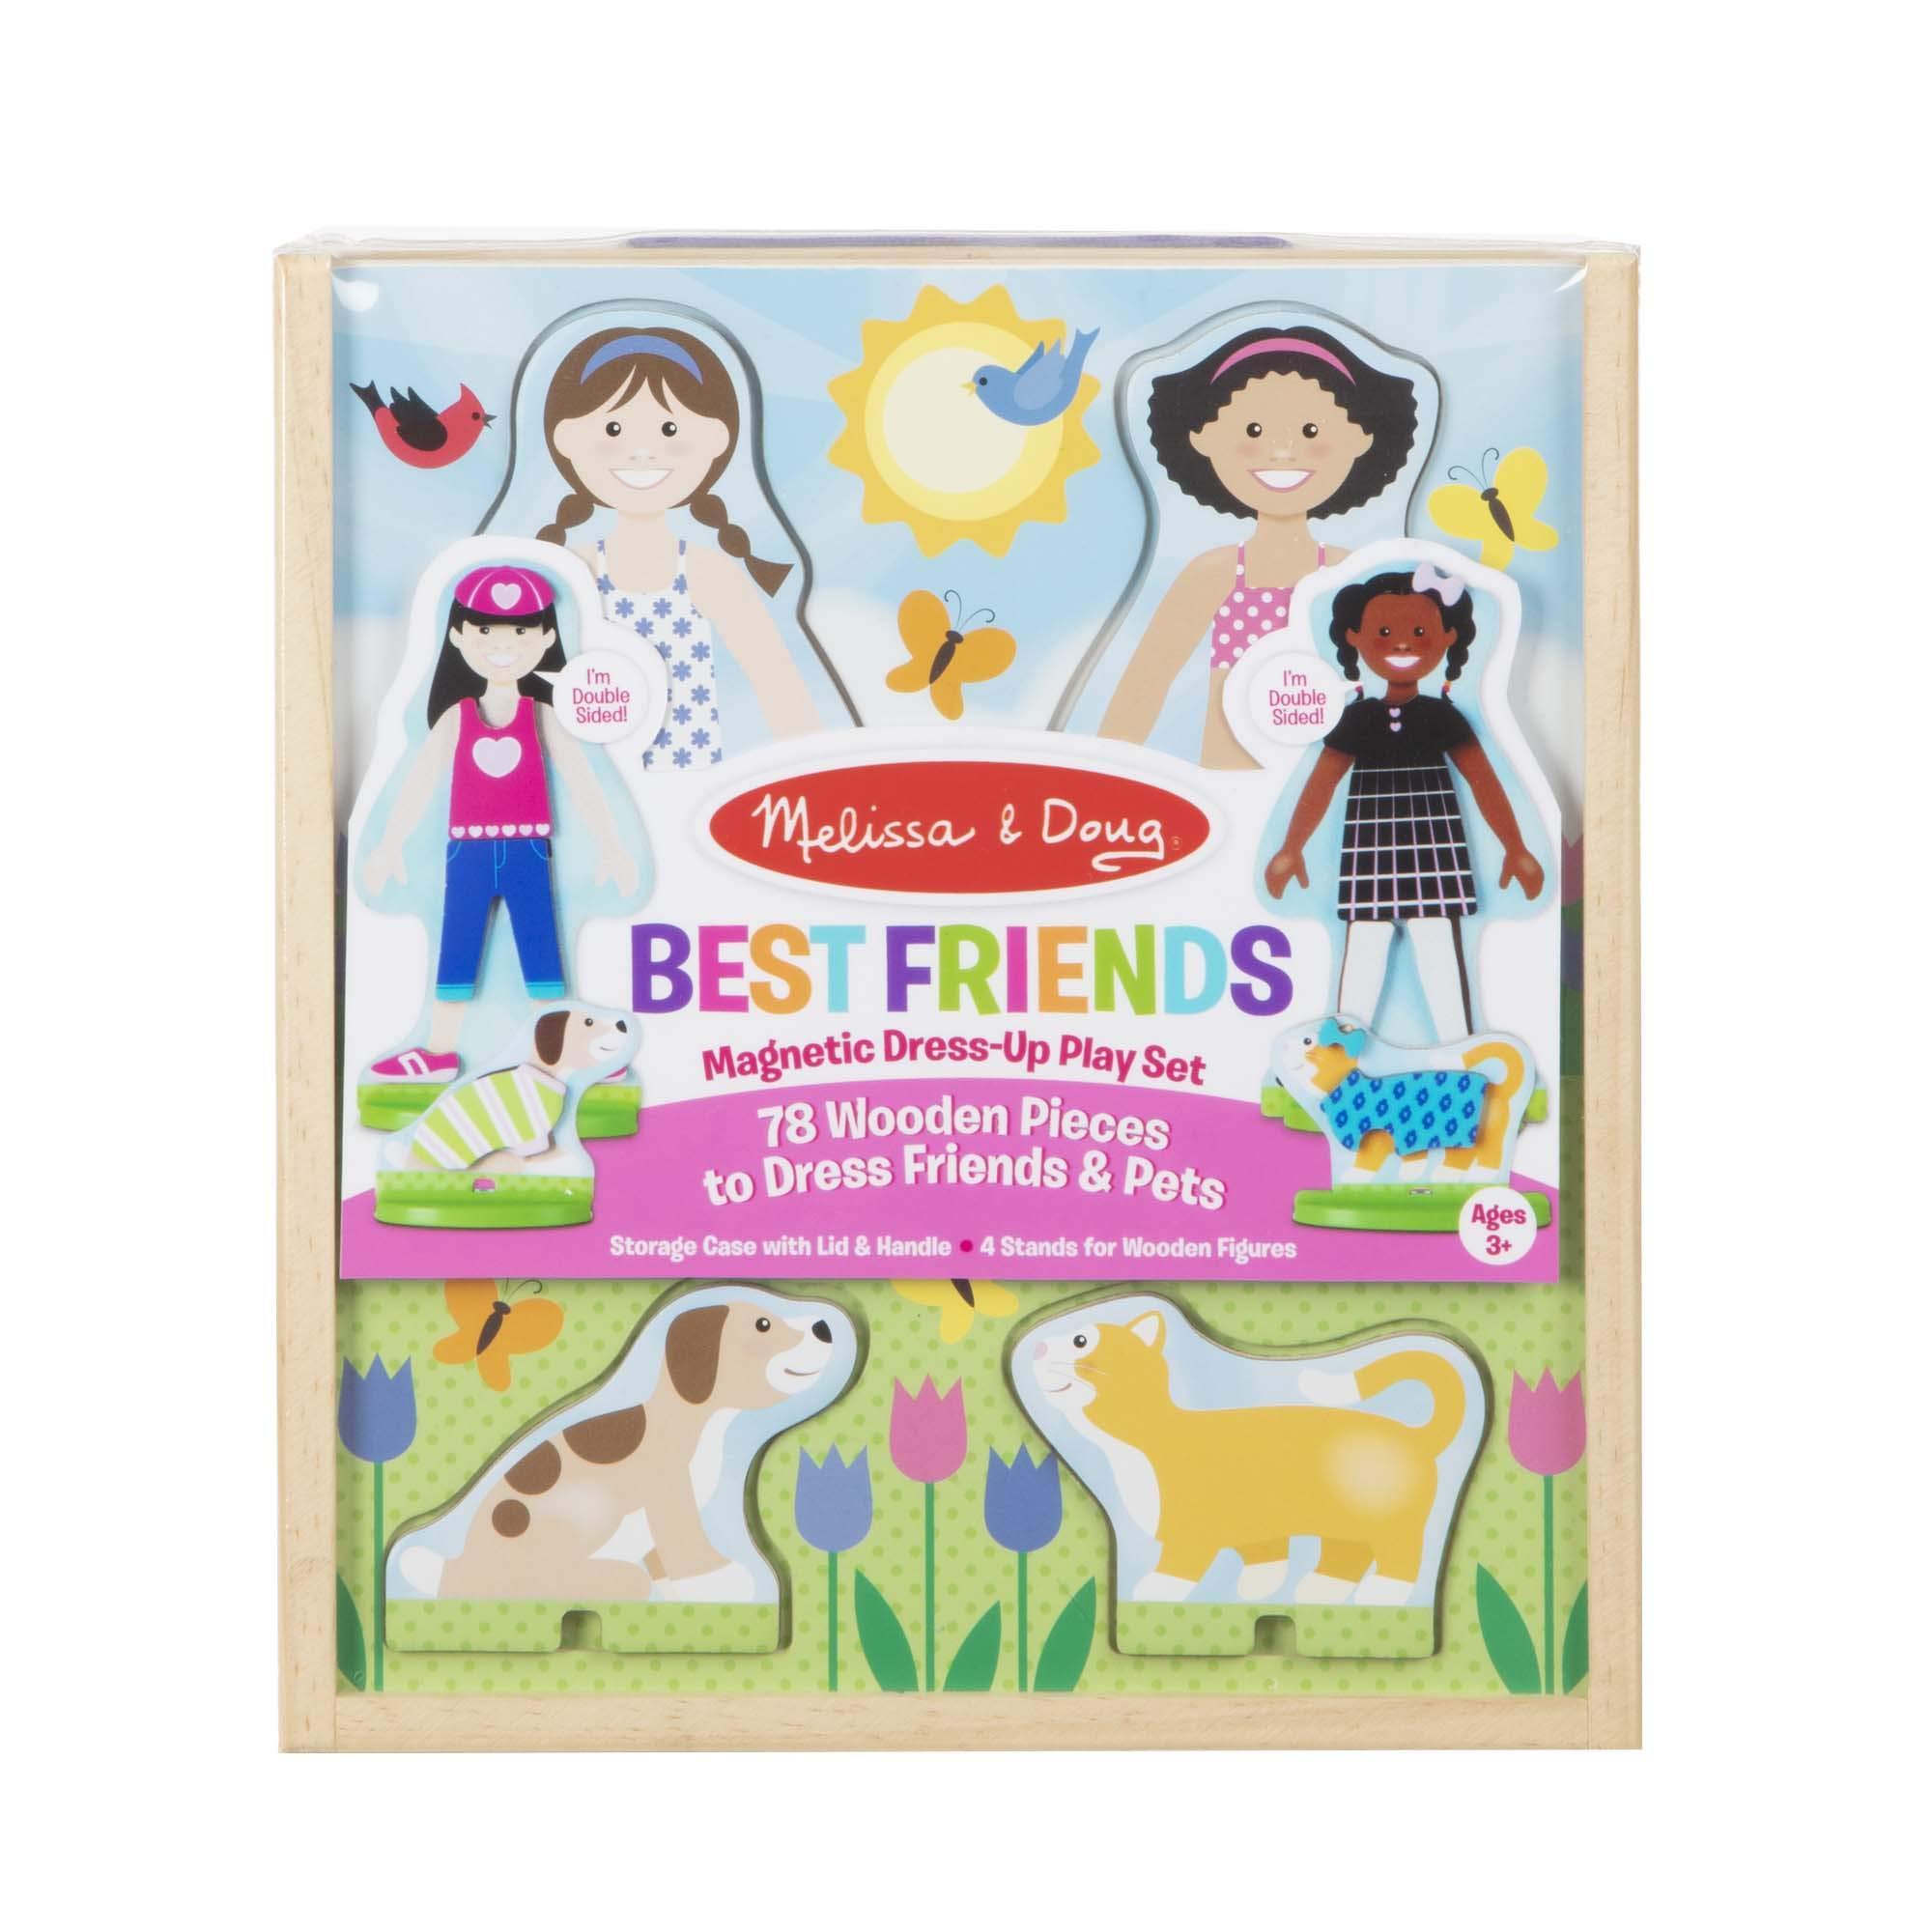 Melissa & Doug Best Friends Magnetic Dress-Up Wooden Dolls Pretend Play Set (78 pcs) by Melissa & Doug